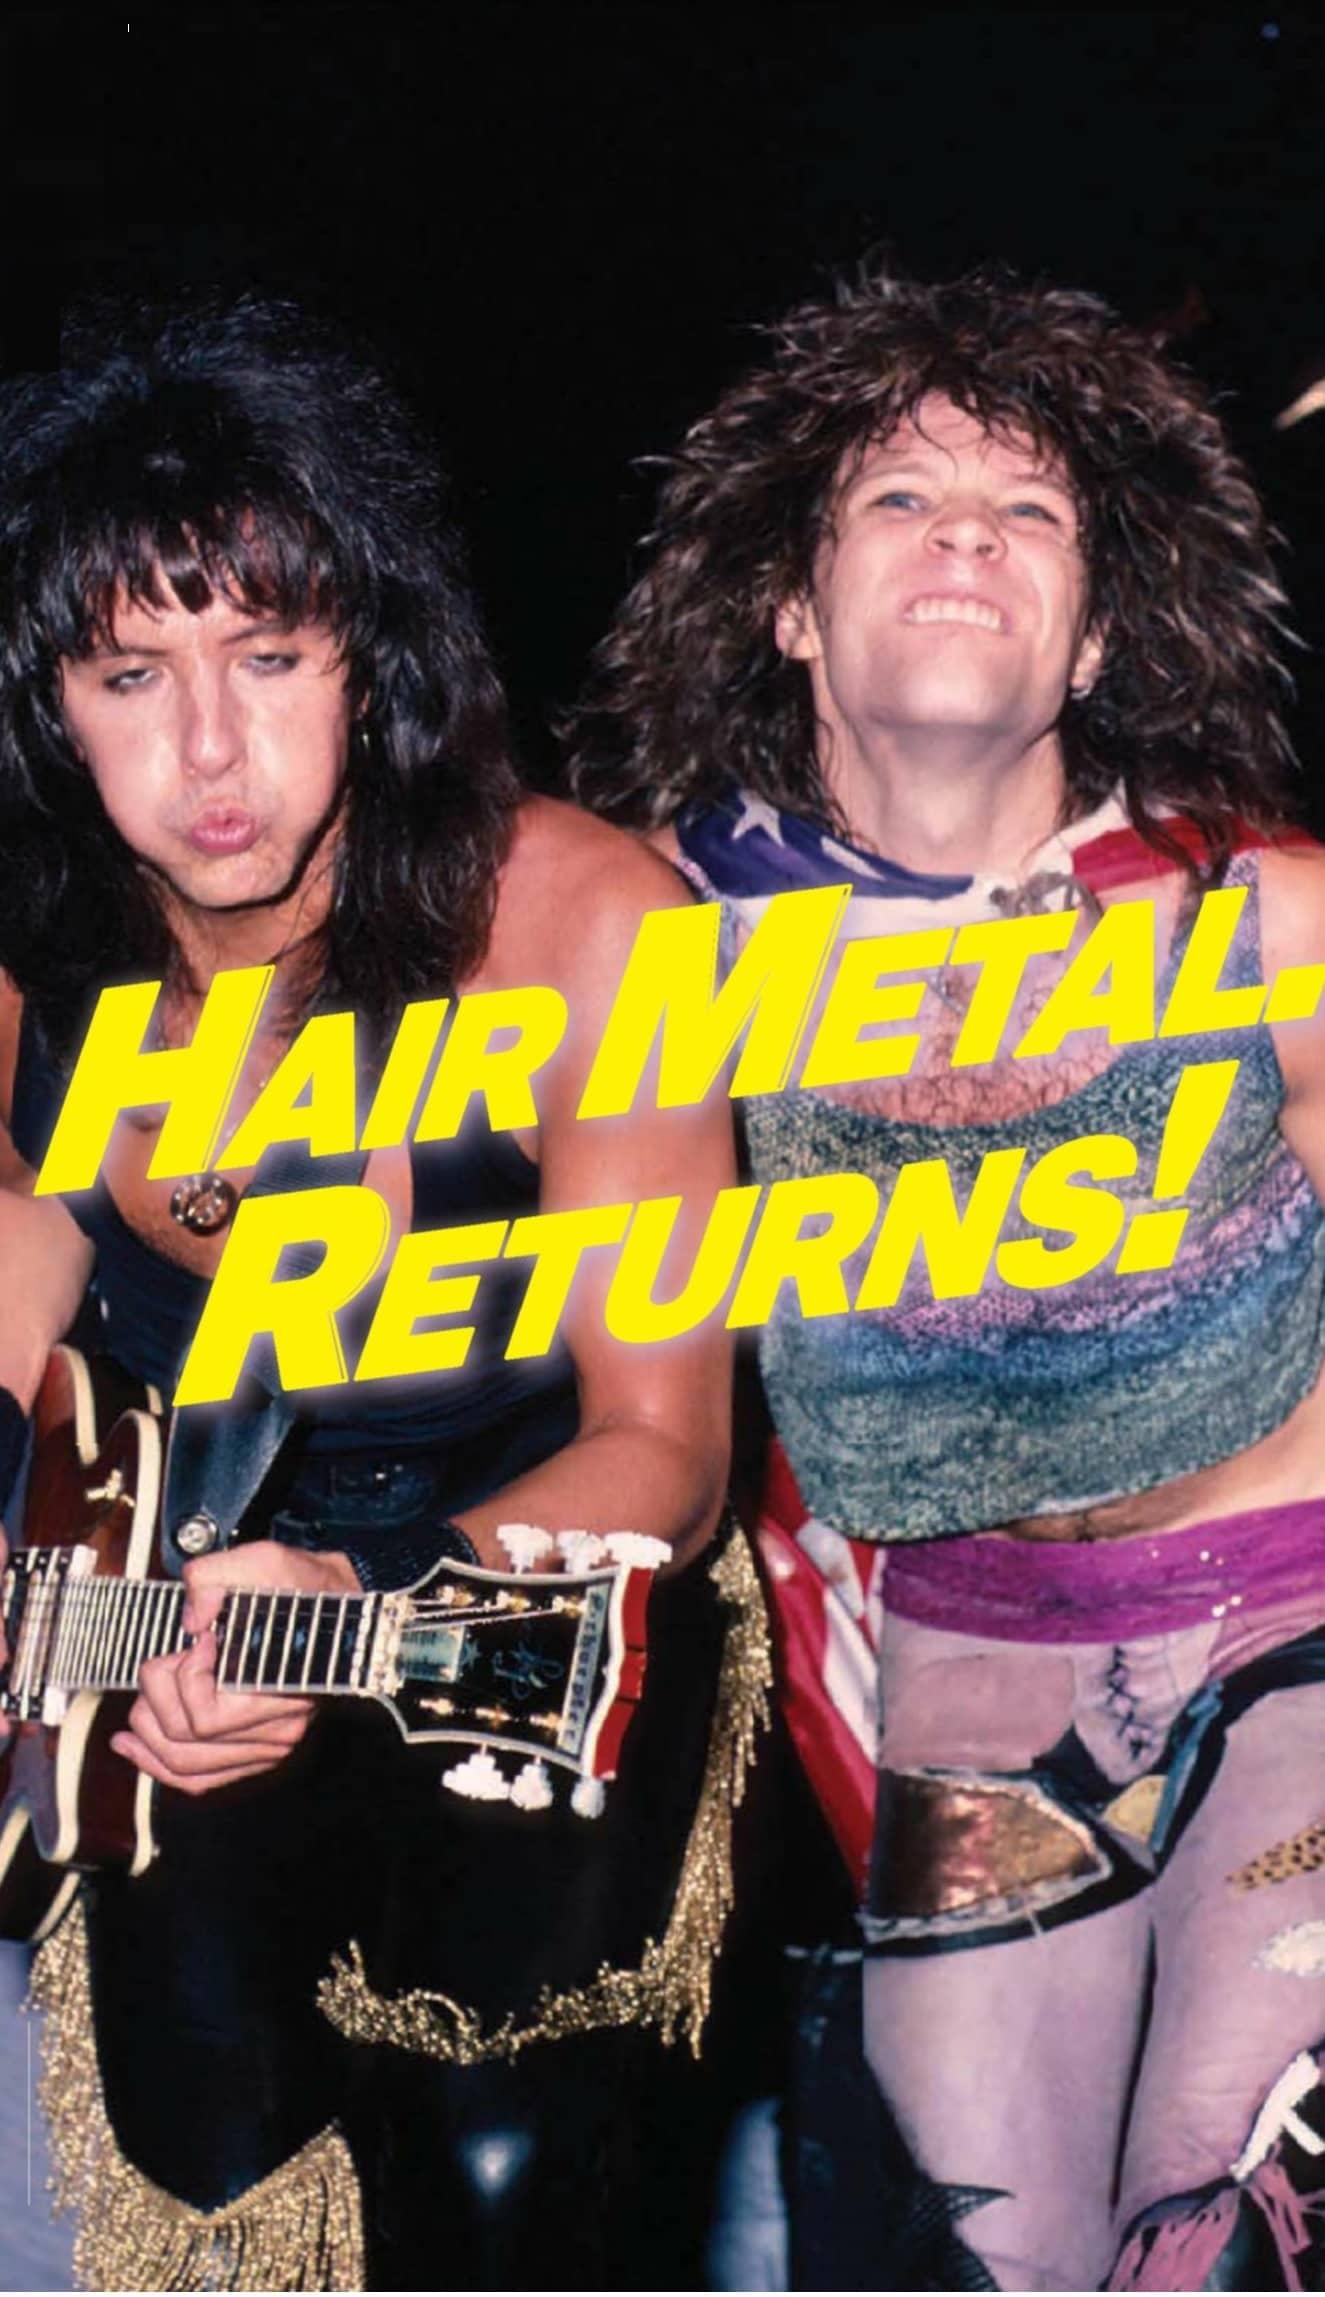 Hair Metal Returns!